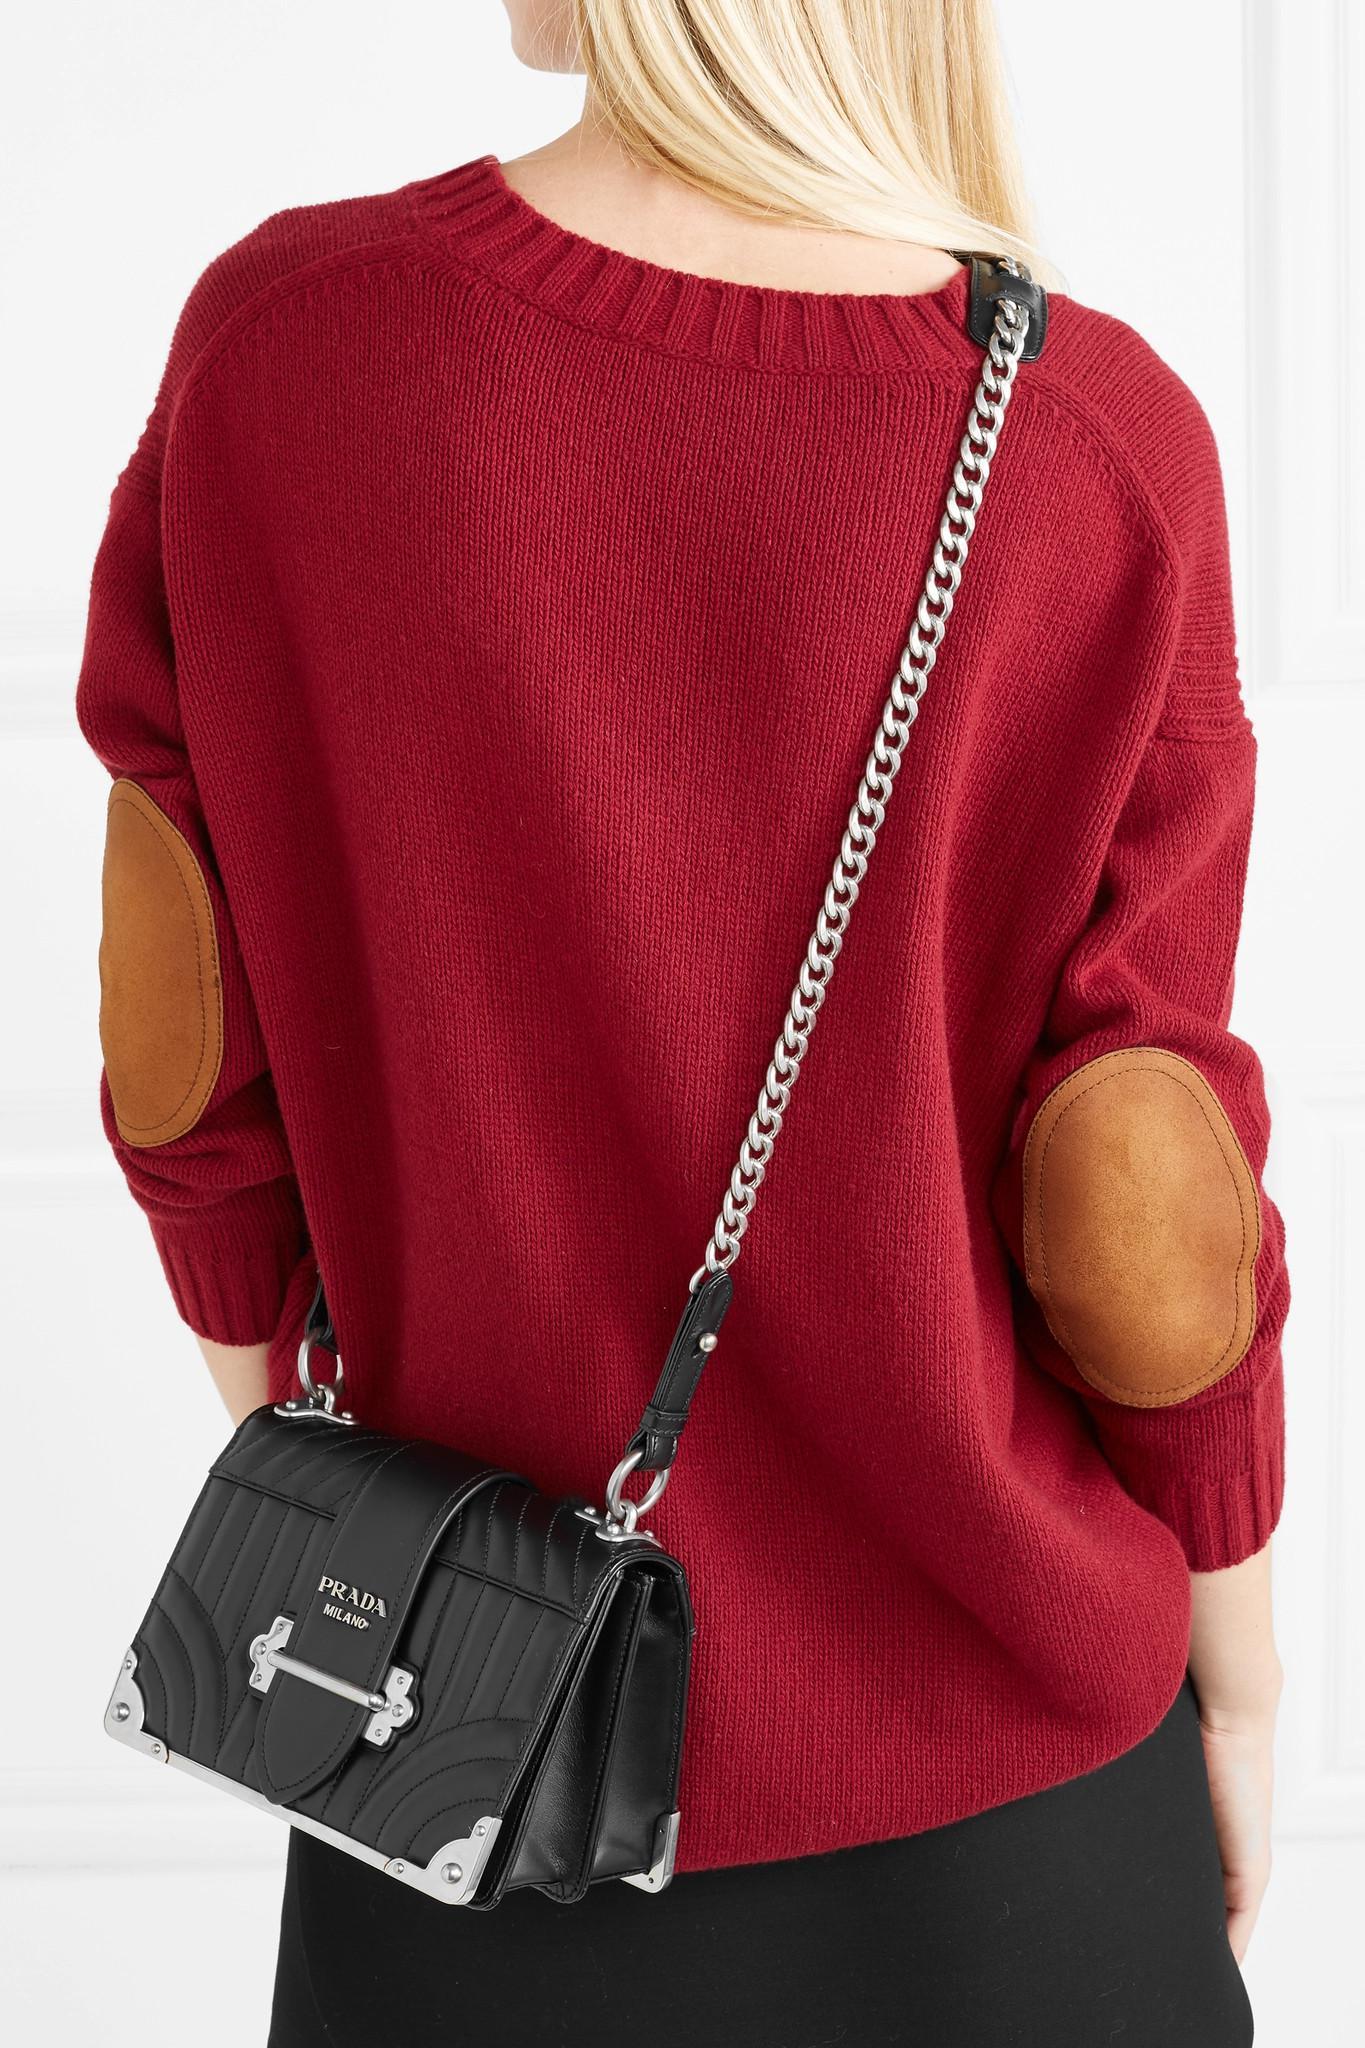 30cd16314ebd Prada Cahier Quilted Leather Shoulder Bag in Black - Lyst